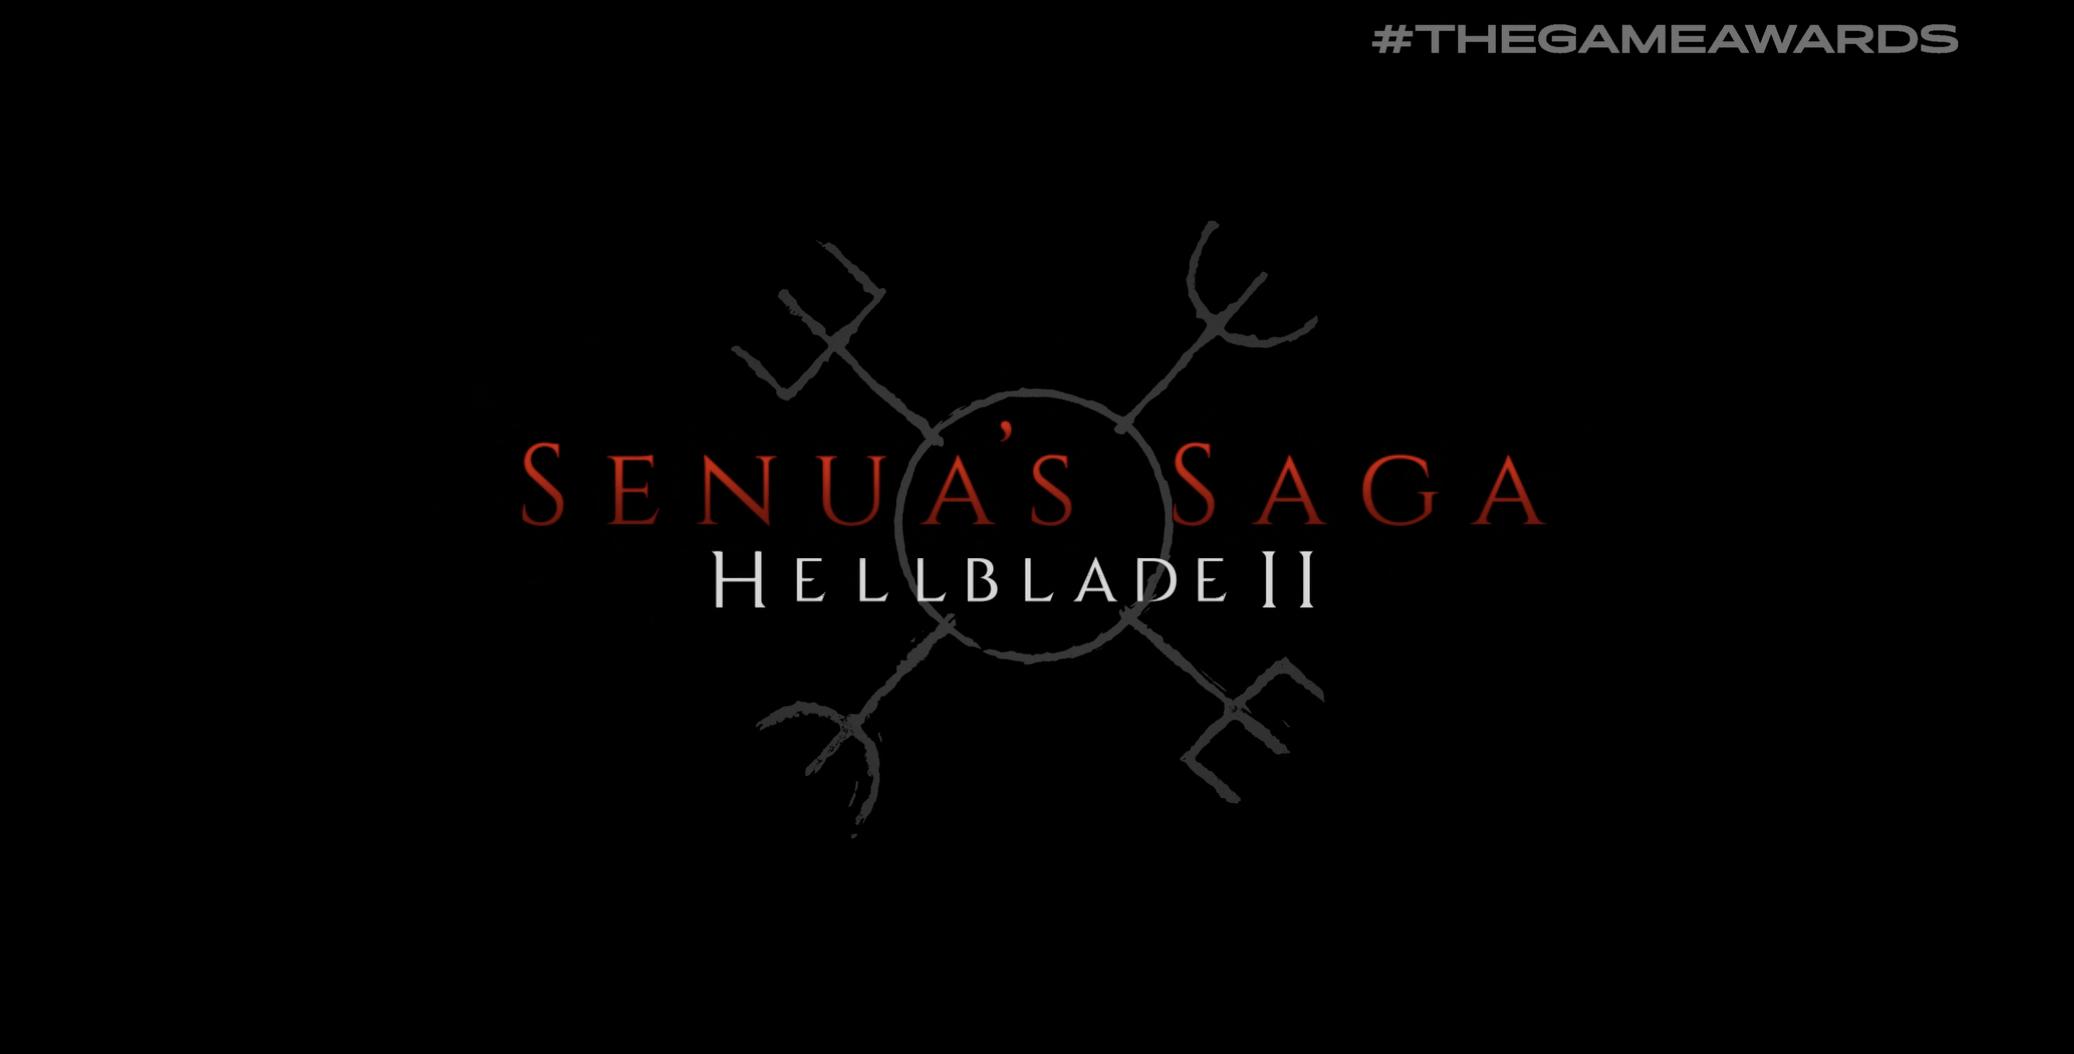 Hellbalde II Senua's Saga